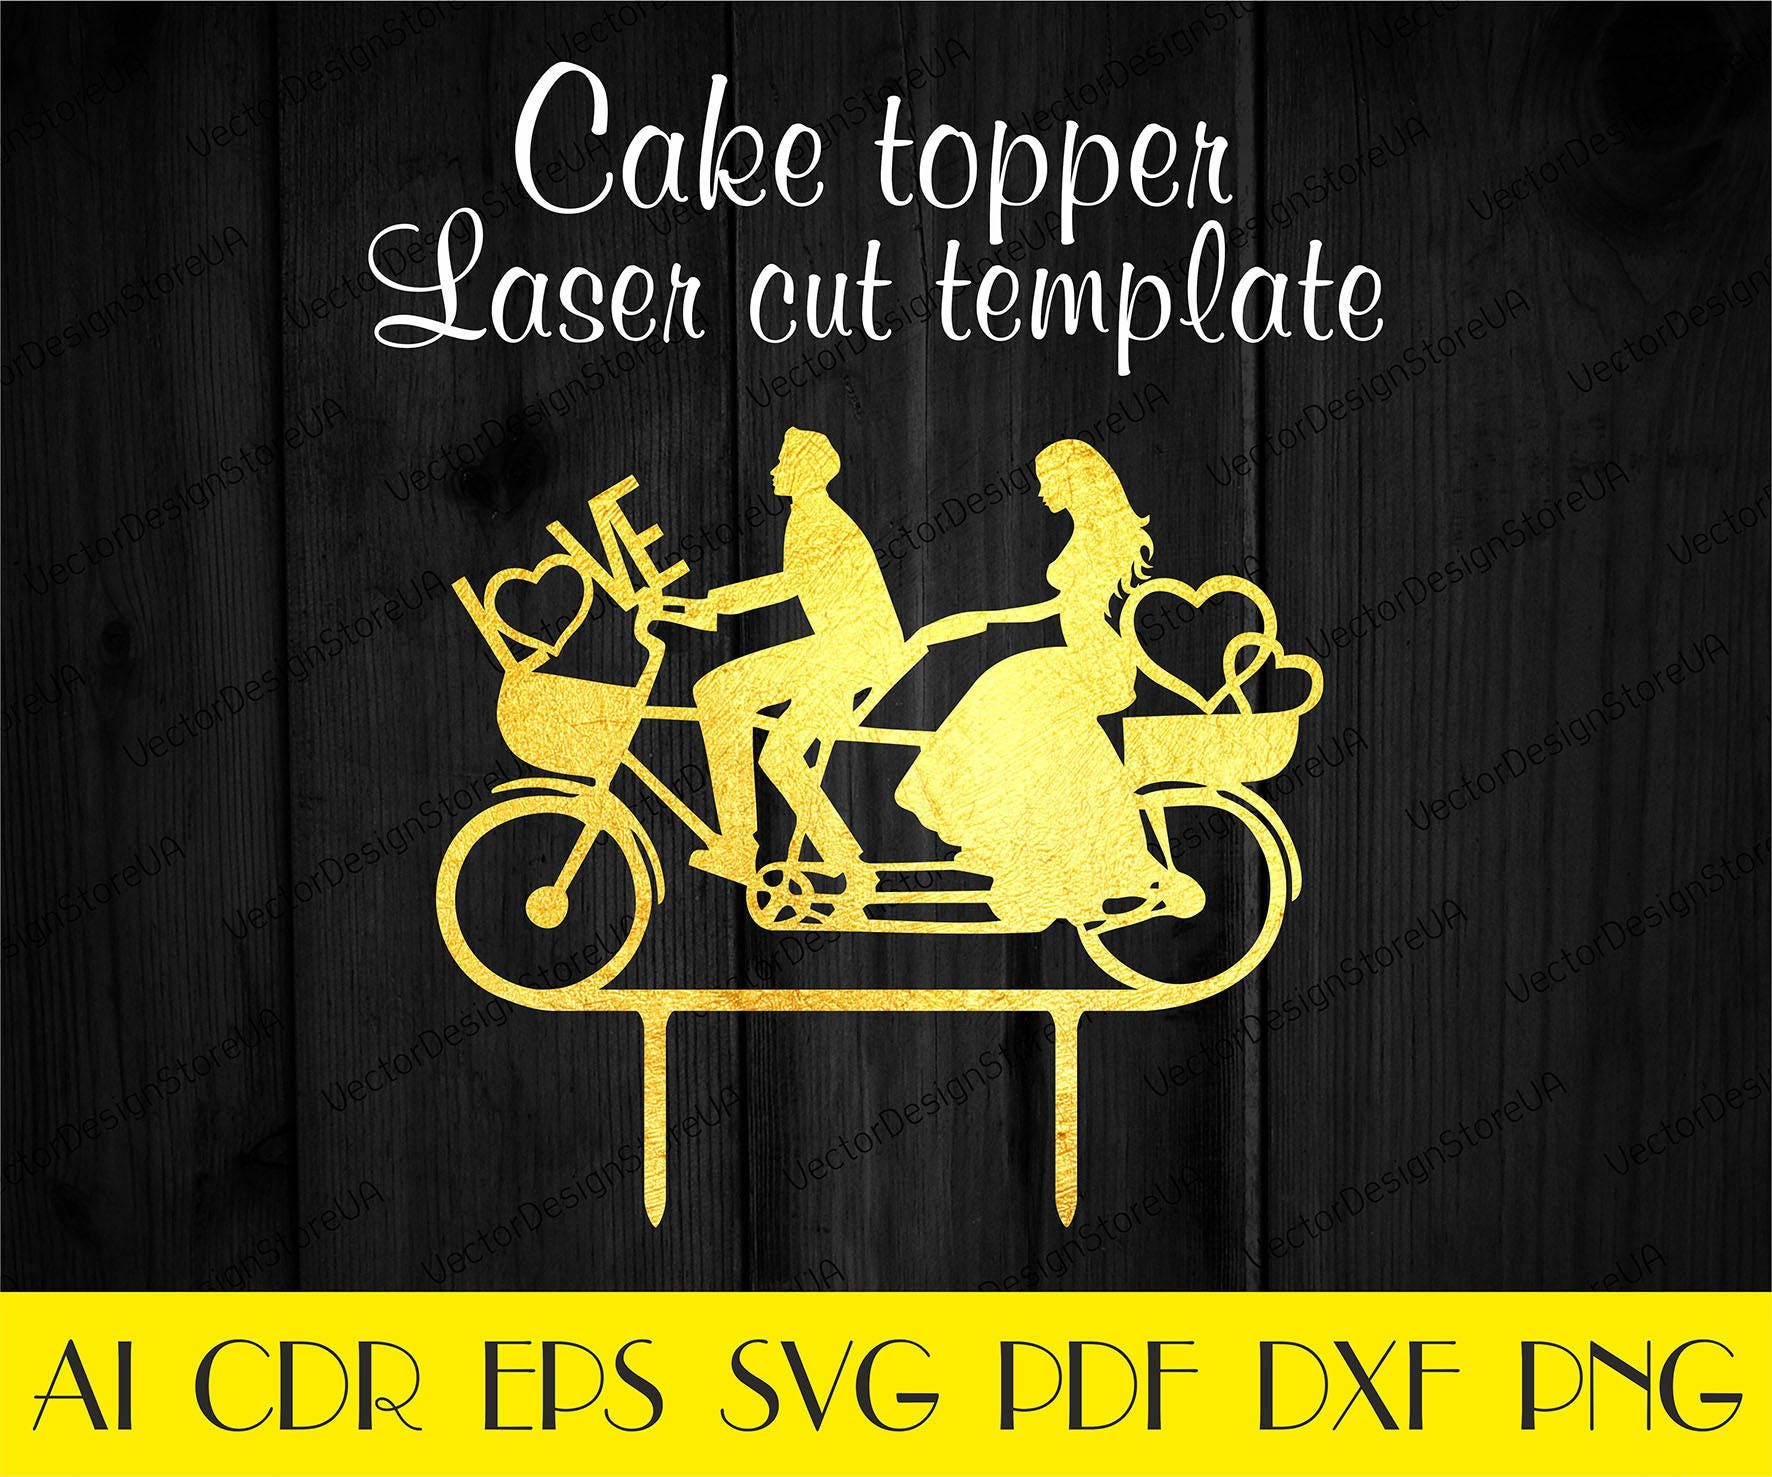 I love you cake topper svgWedding cake topperAnniversary | Etsy